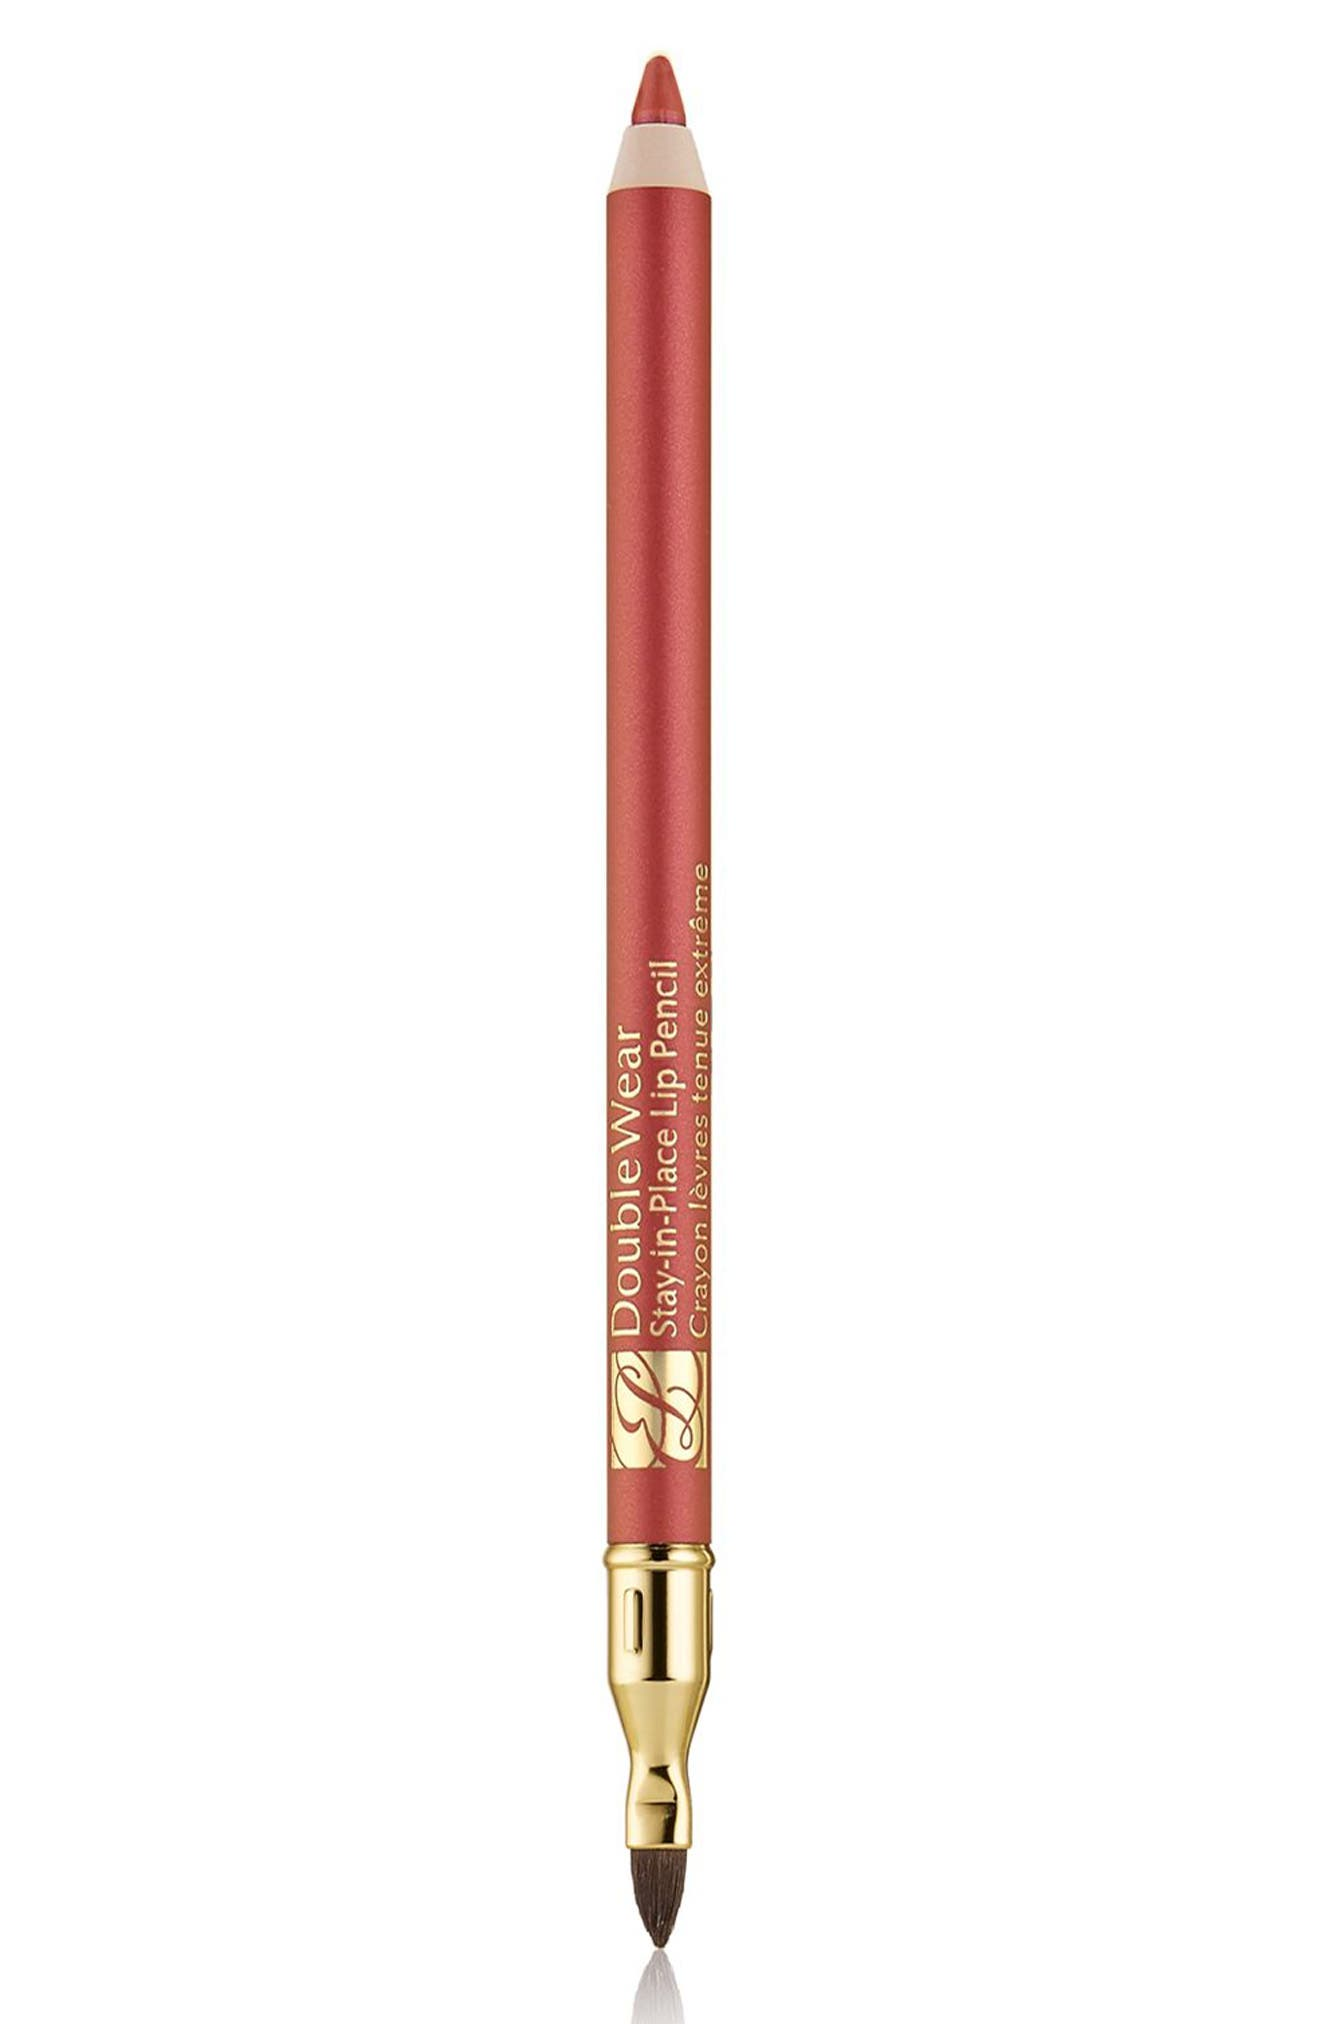 Estee Lauder Double Wear Stay-In-Place Lip Pencil - Rose